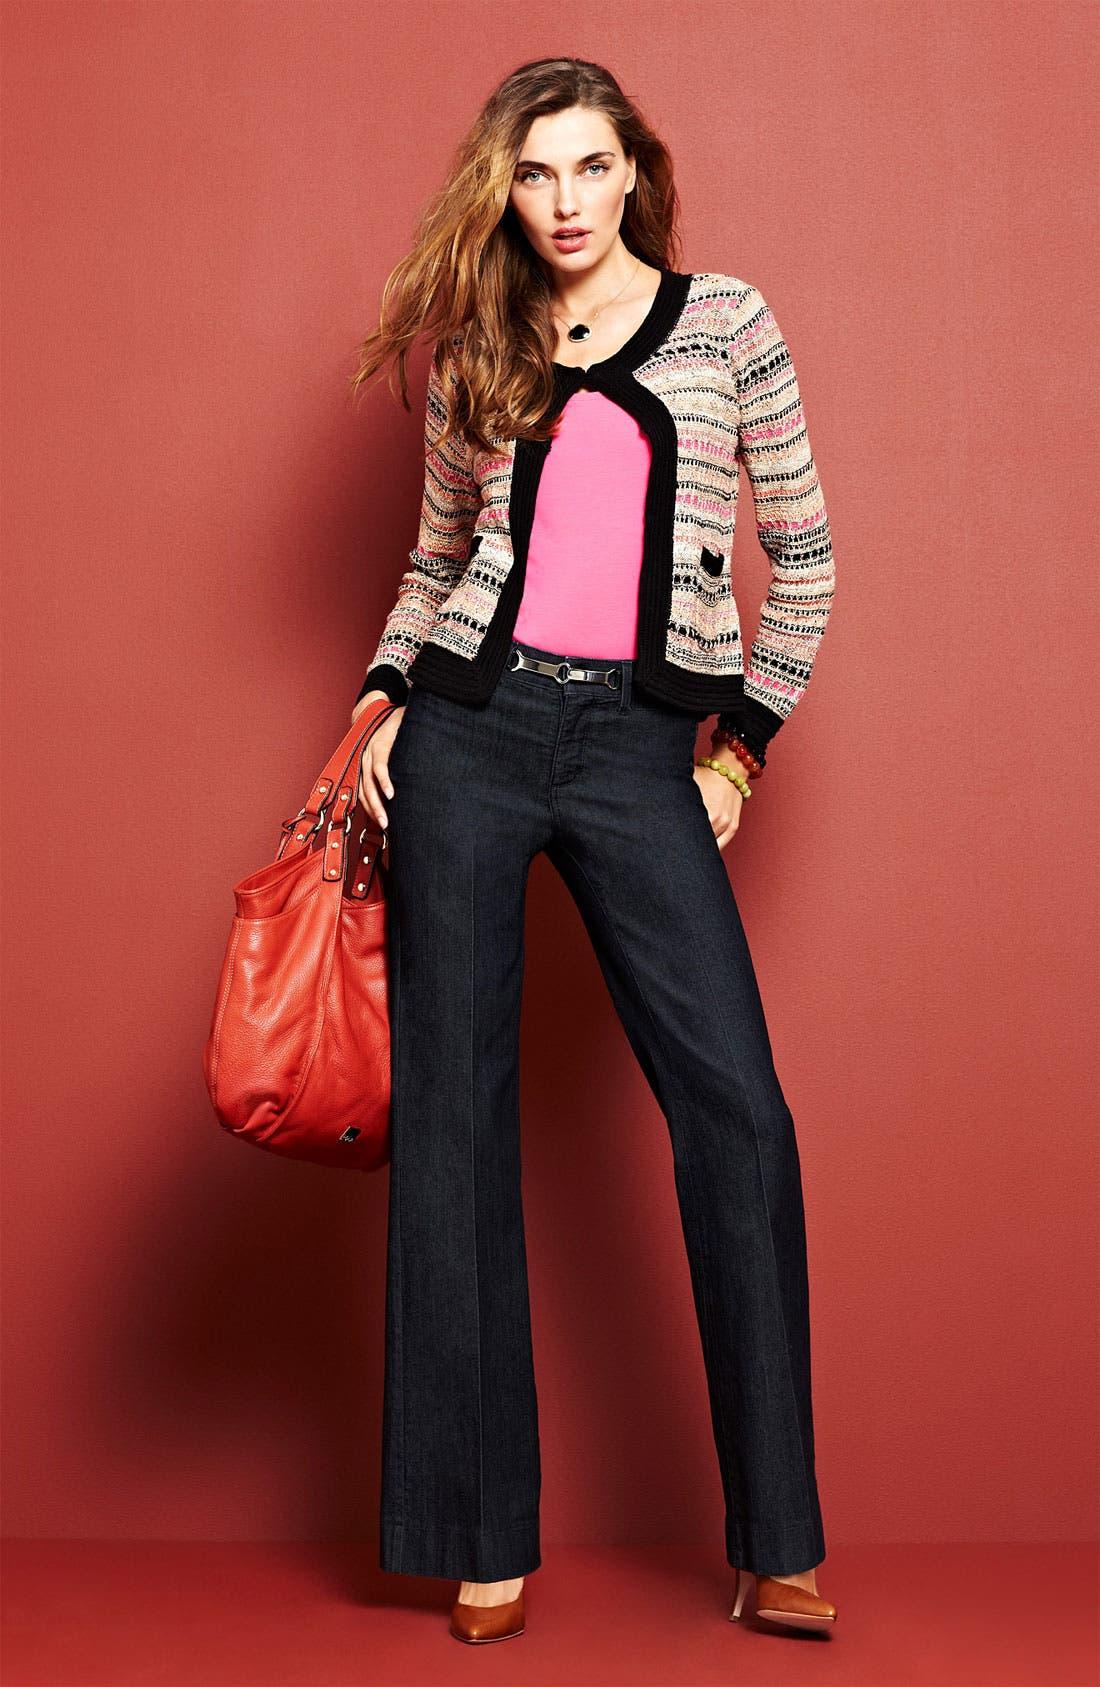 Alternate Image 1 Selected - Nic + Zoe Cardigan & Tank, NYDJ 'Greta' Jeans